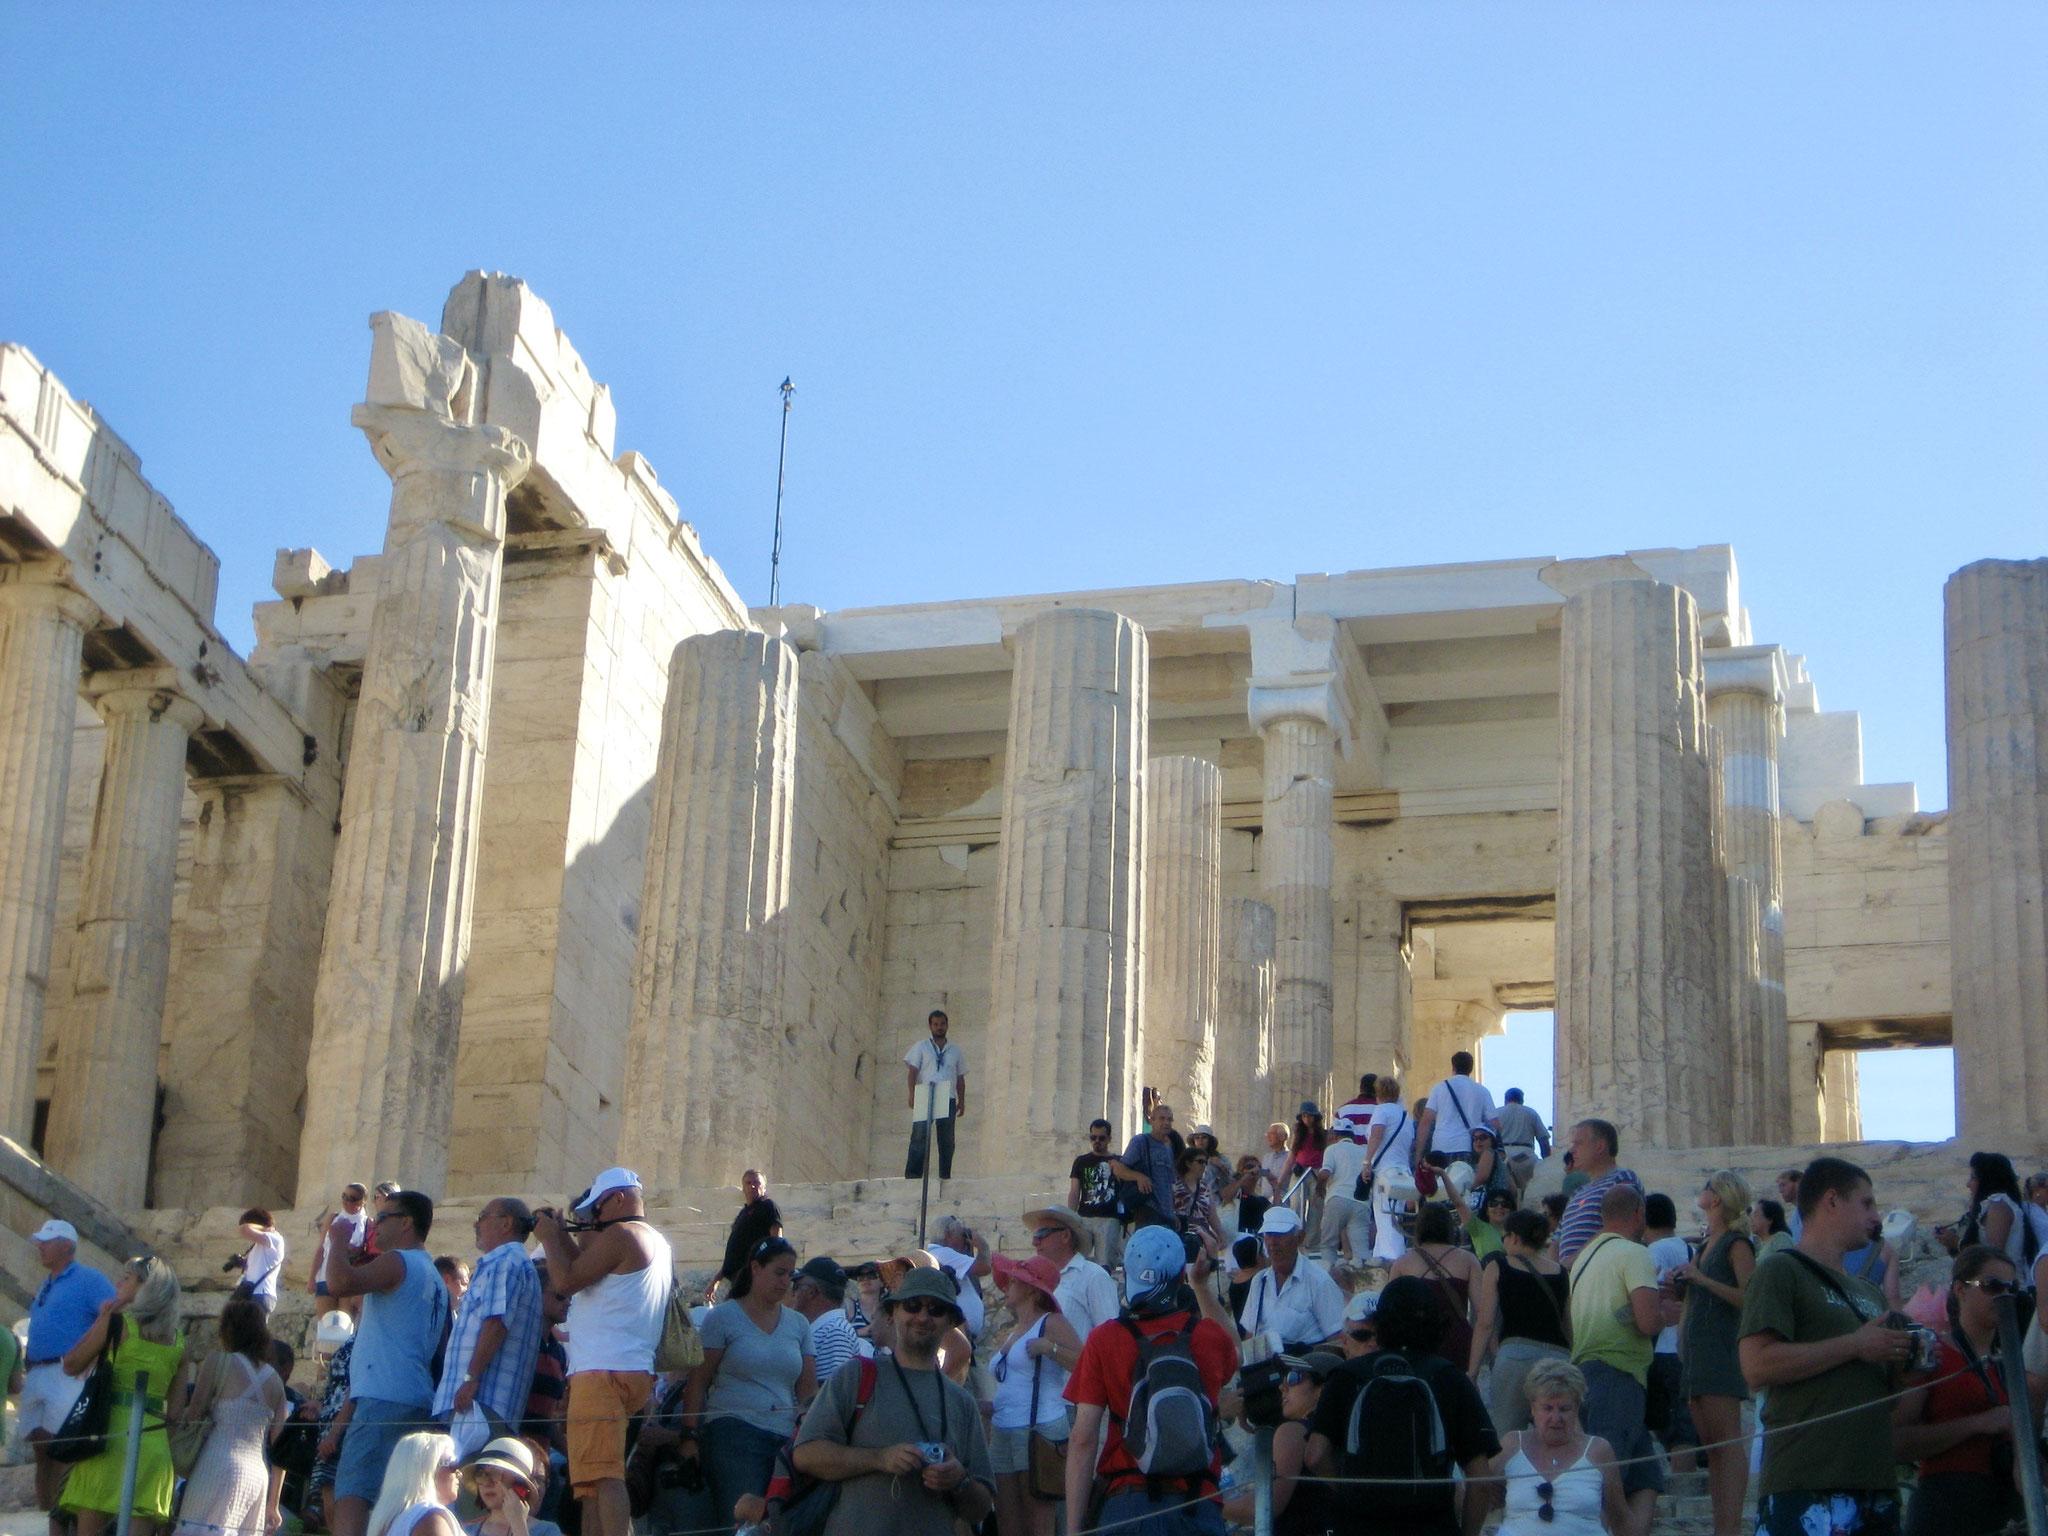 Ancient Library of Celsus, Ephesus (Selçuk)